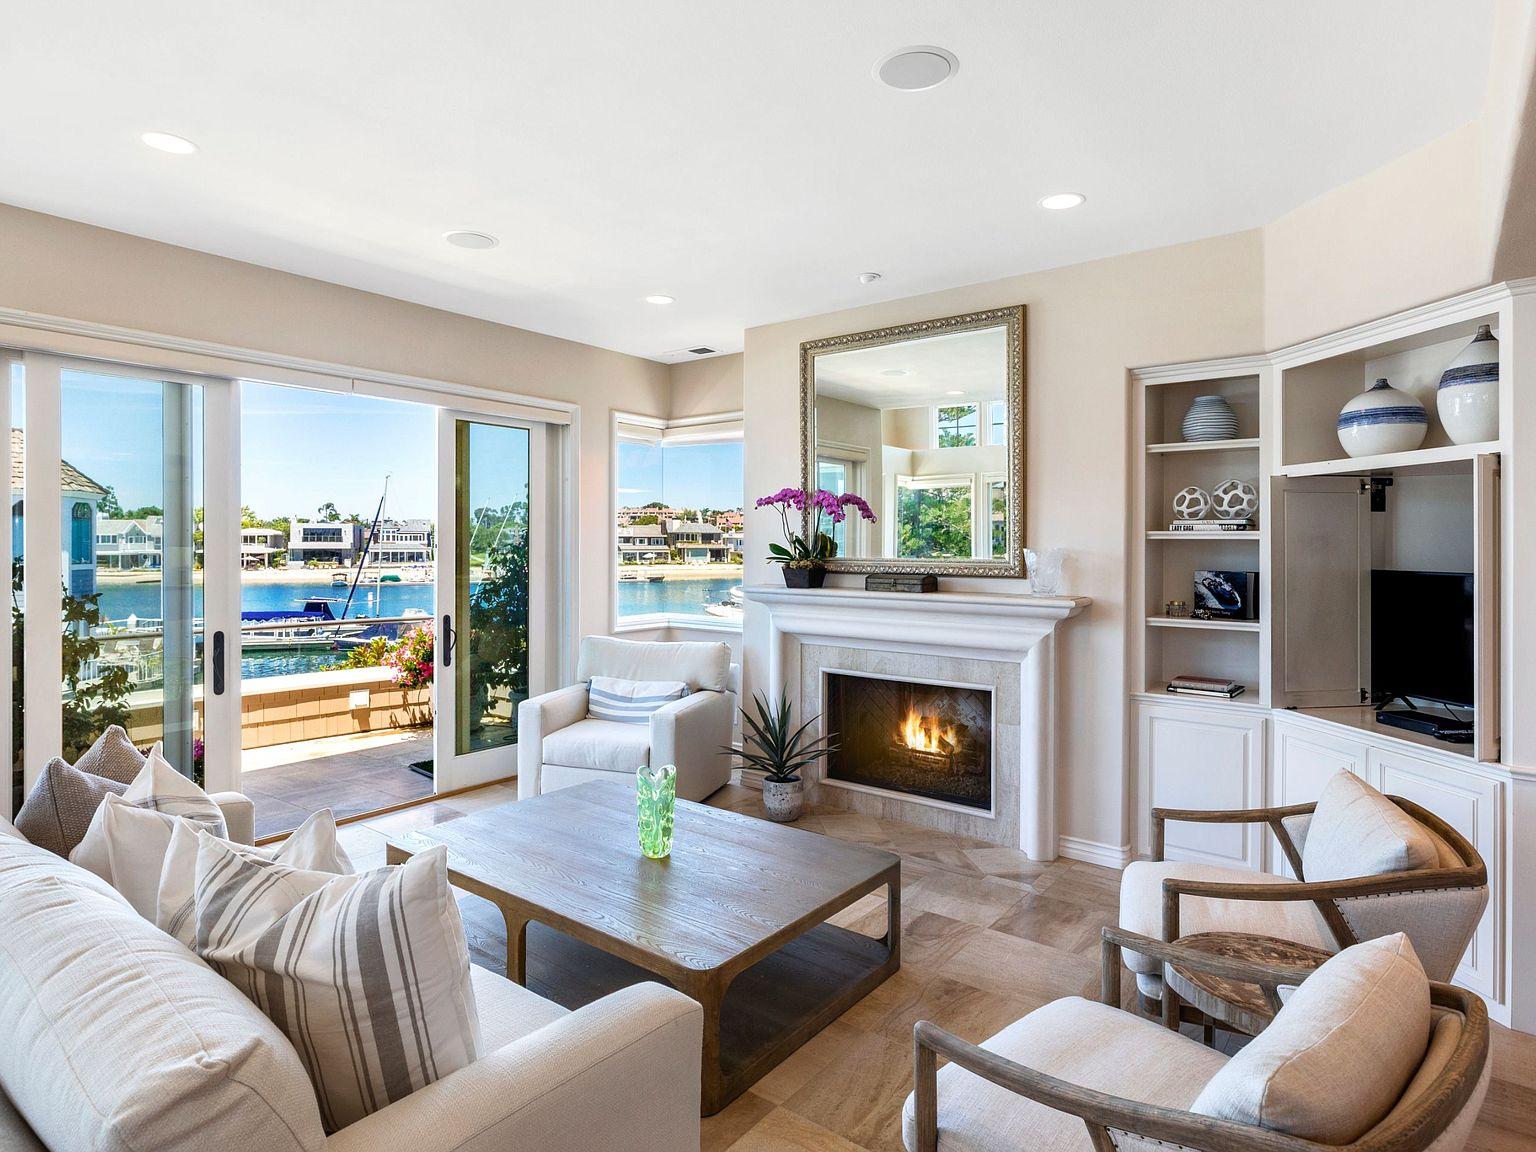 newport beach houses for sale ocean view